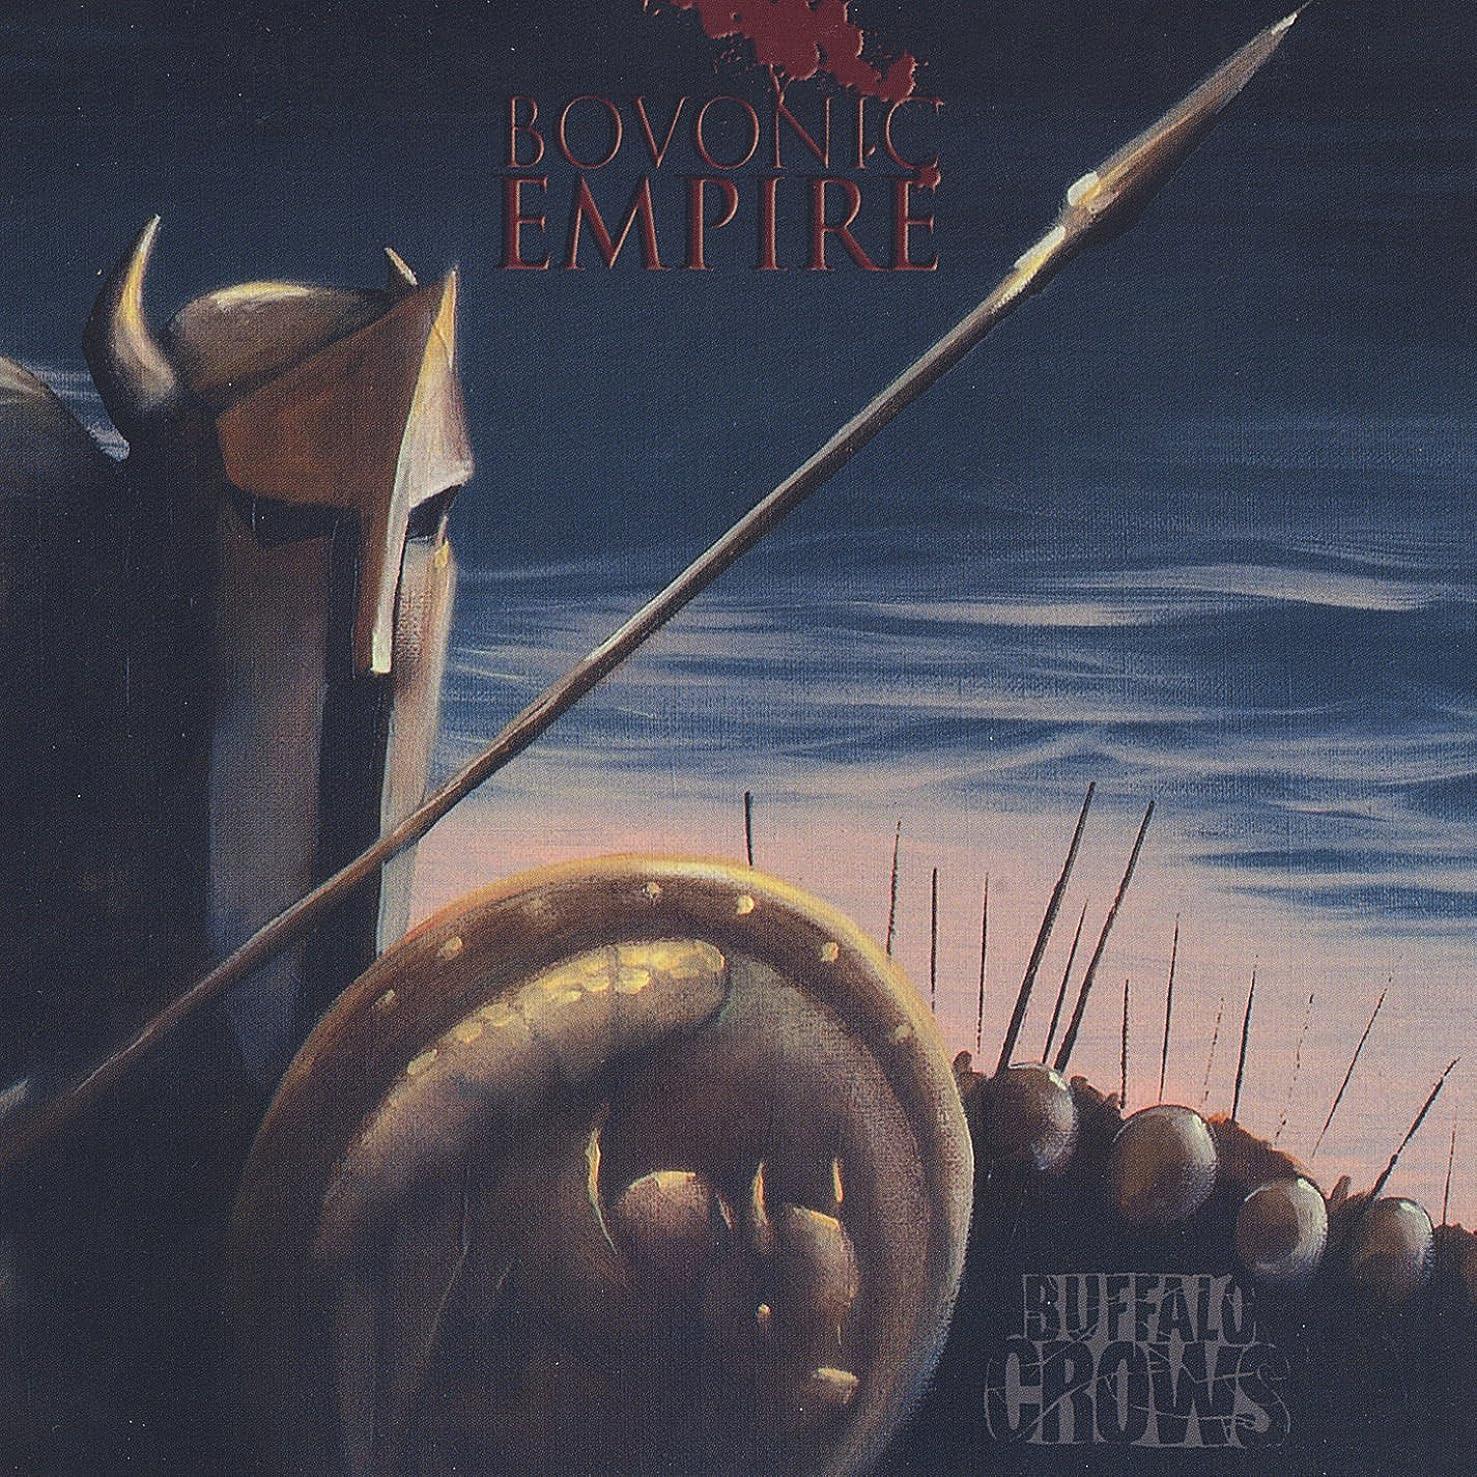 Bovonic Empire